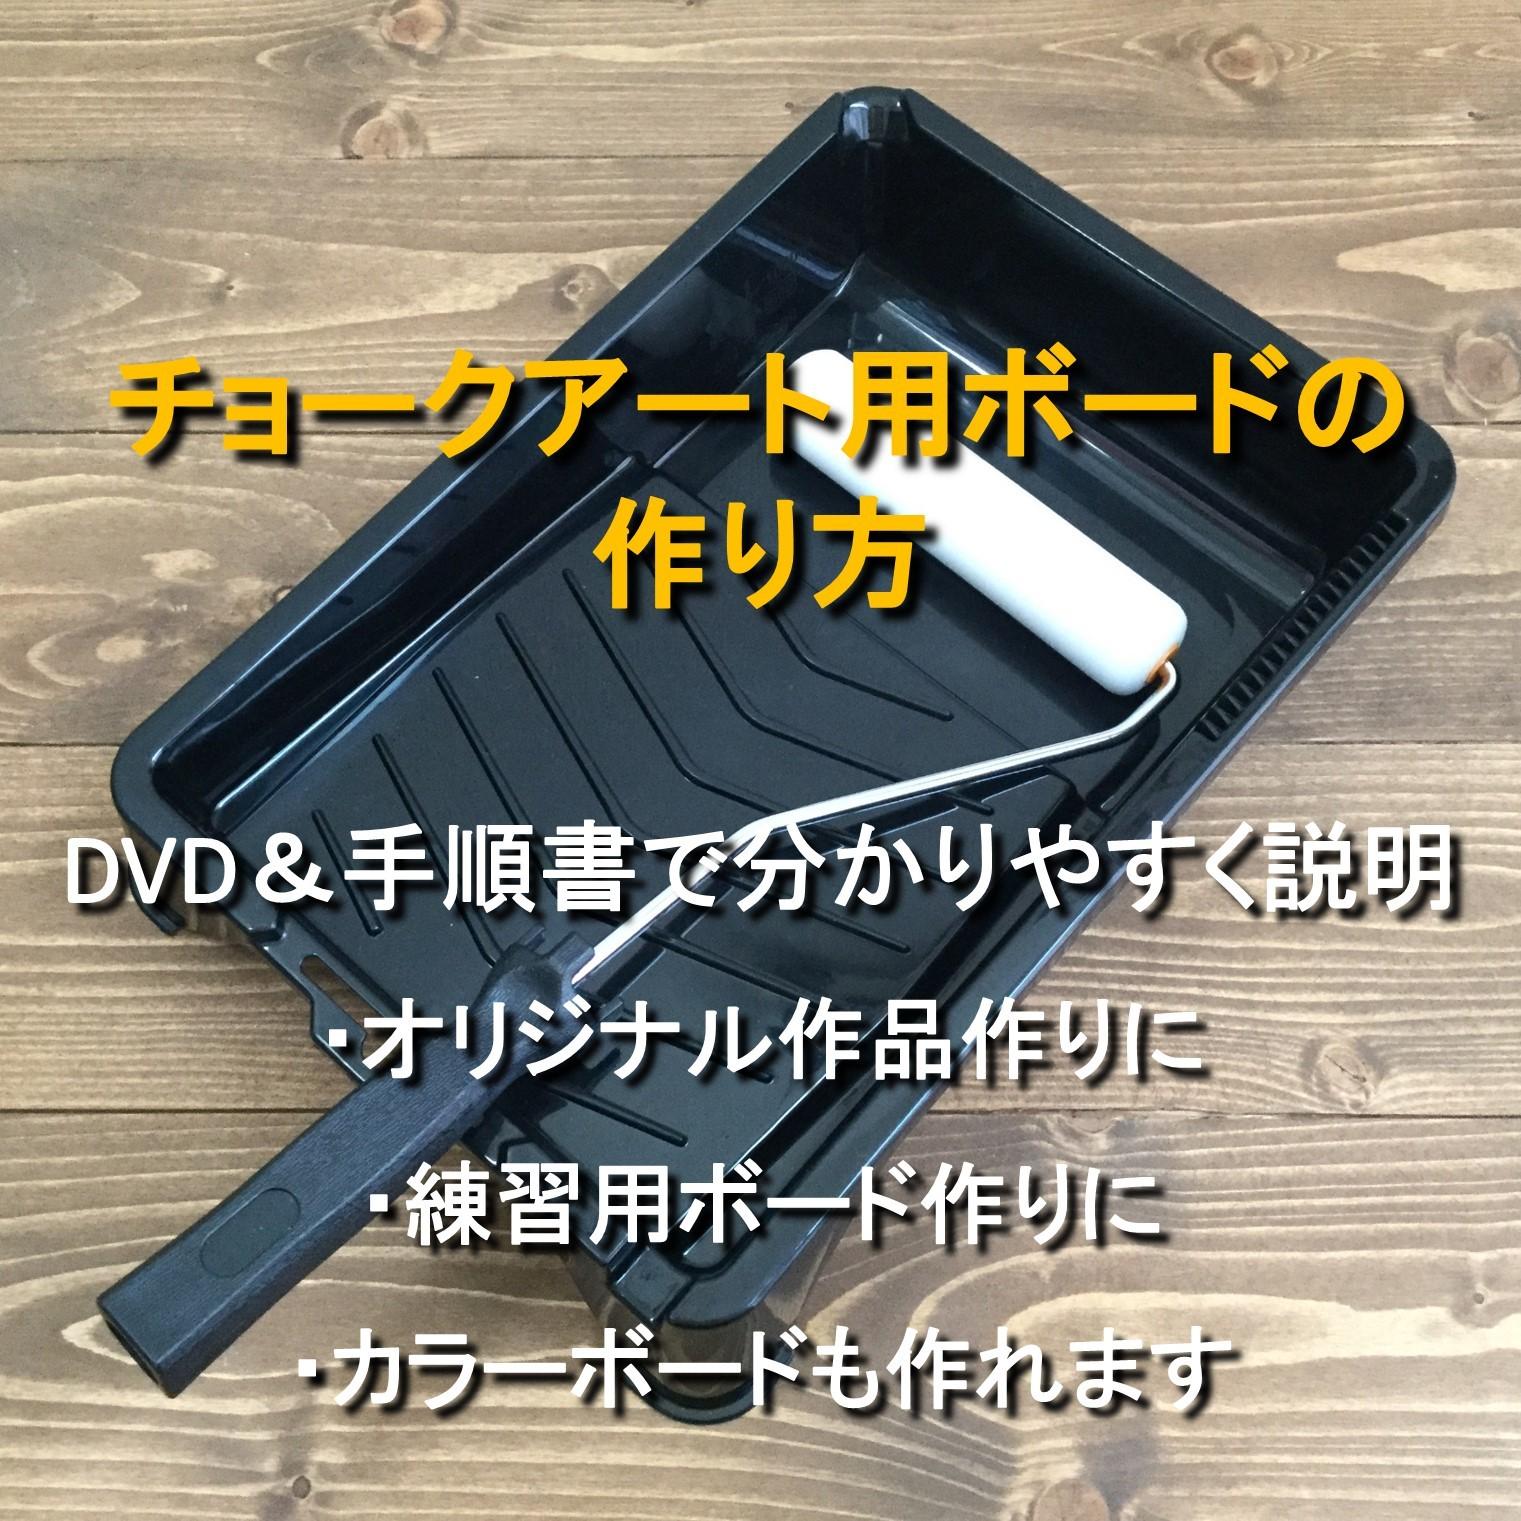 [DVD版]チョークアート用ボードの作り方